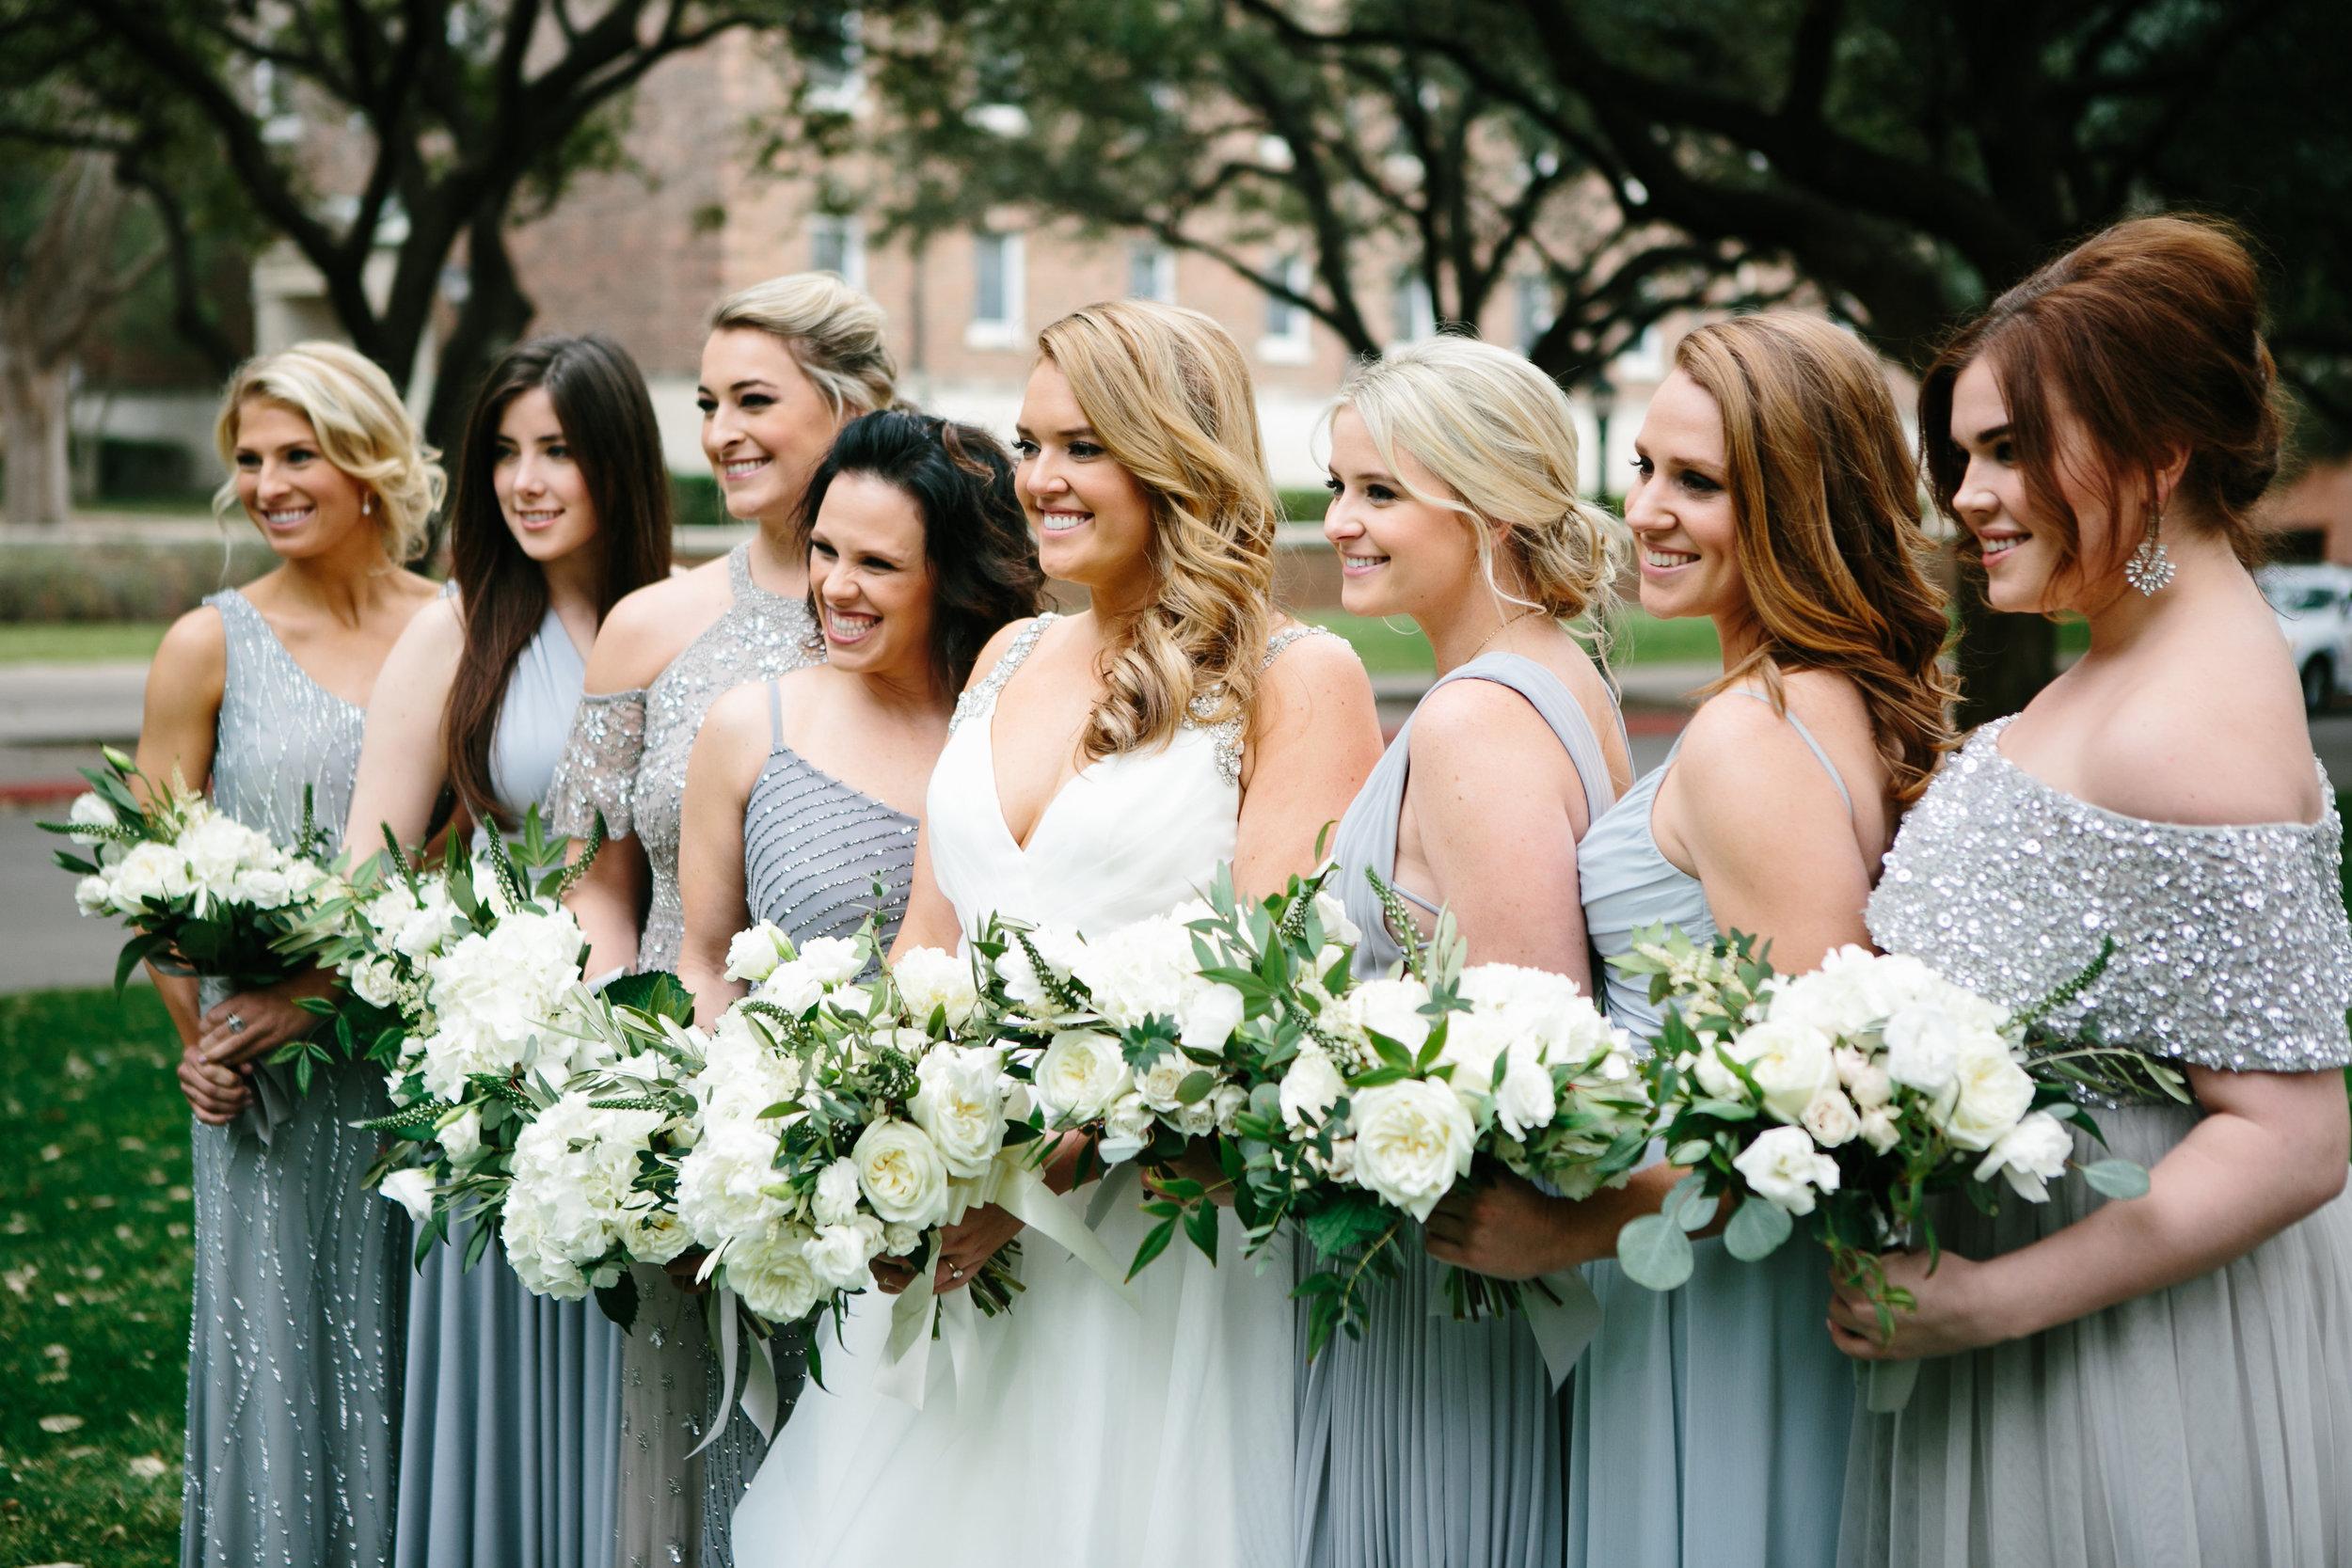 Bridal Party Details - Dallas, Texas - Winter Wedding - Julian Leaver Events